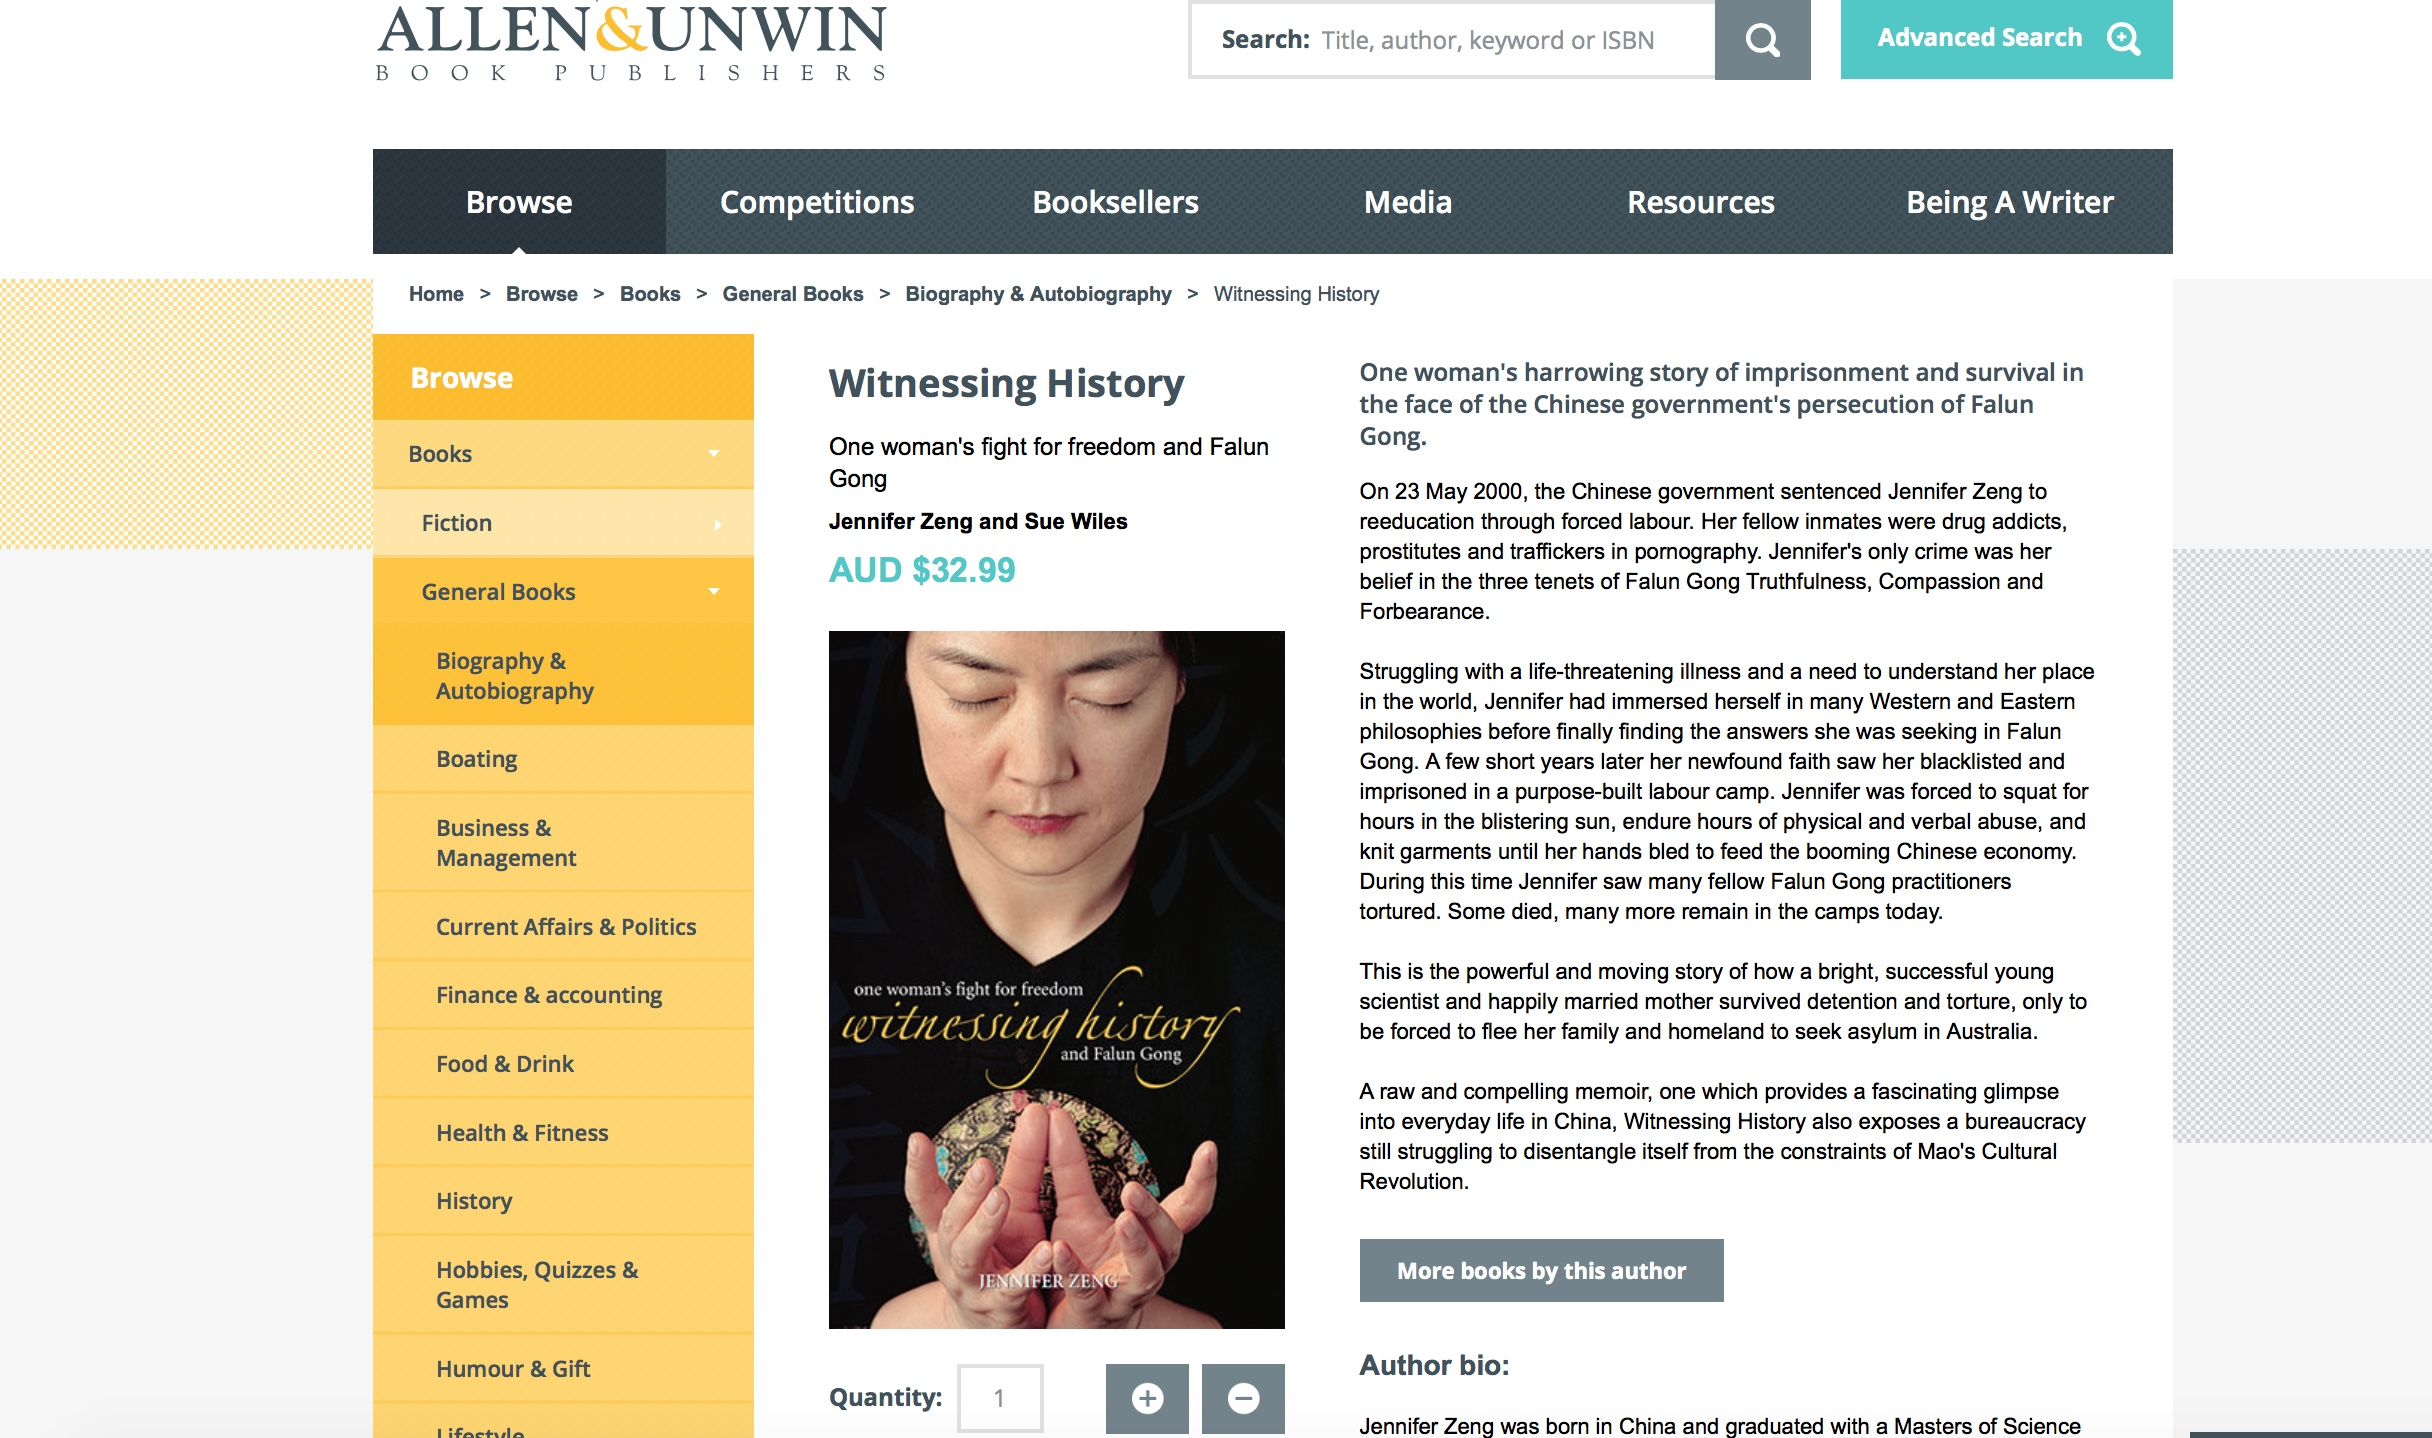 Jennifer's book on Allen & Unwin's website at: https://www.allenandunwin.com/browse/books/general-books/biography-autobiography/Witnessing-History-Jennifer-Zeng-translated-by-Sue-Wiles-9781741144000